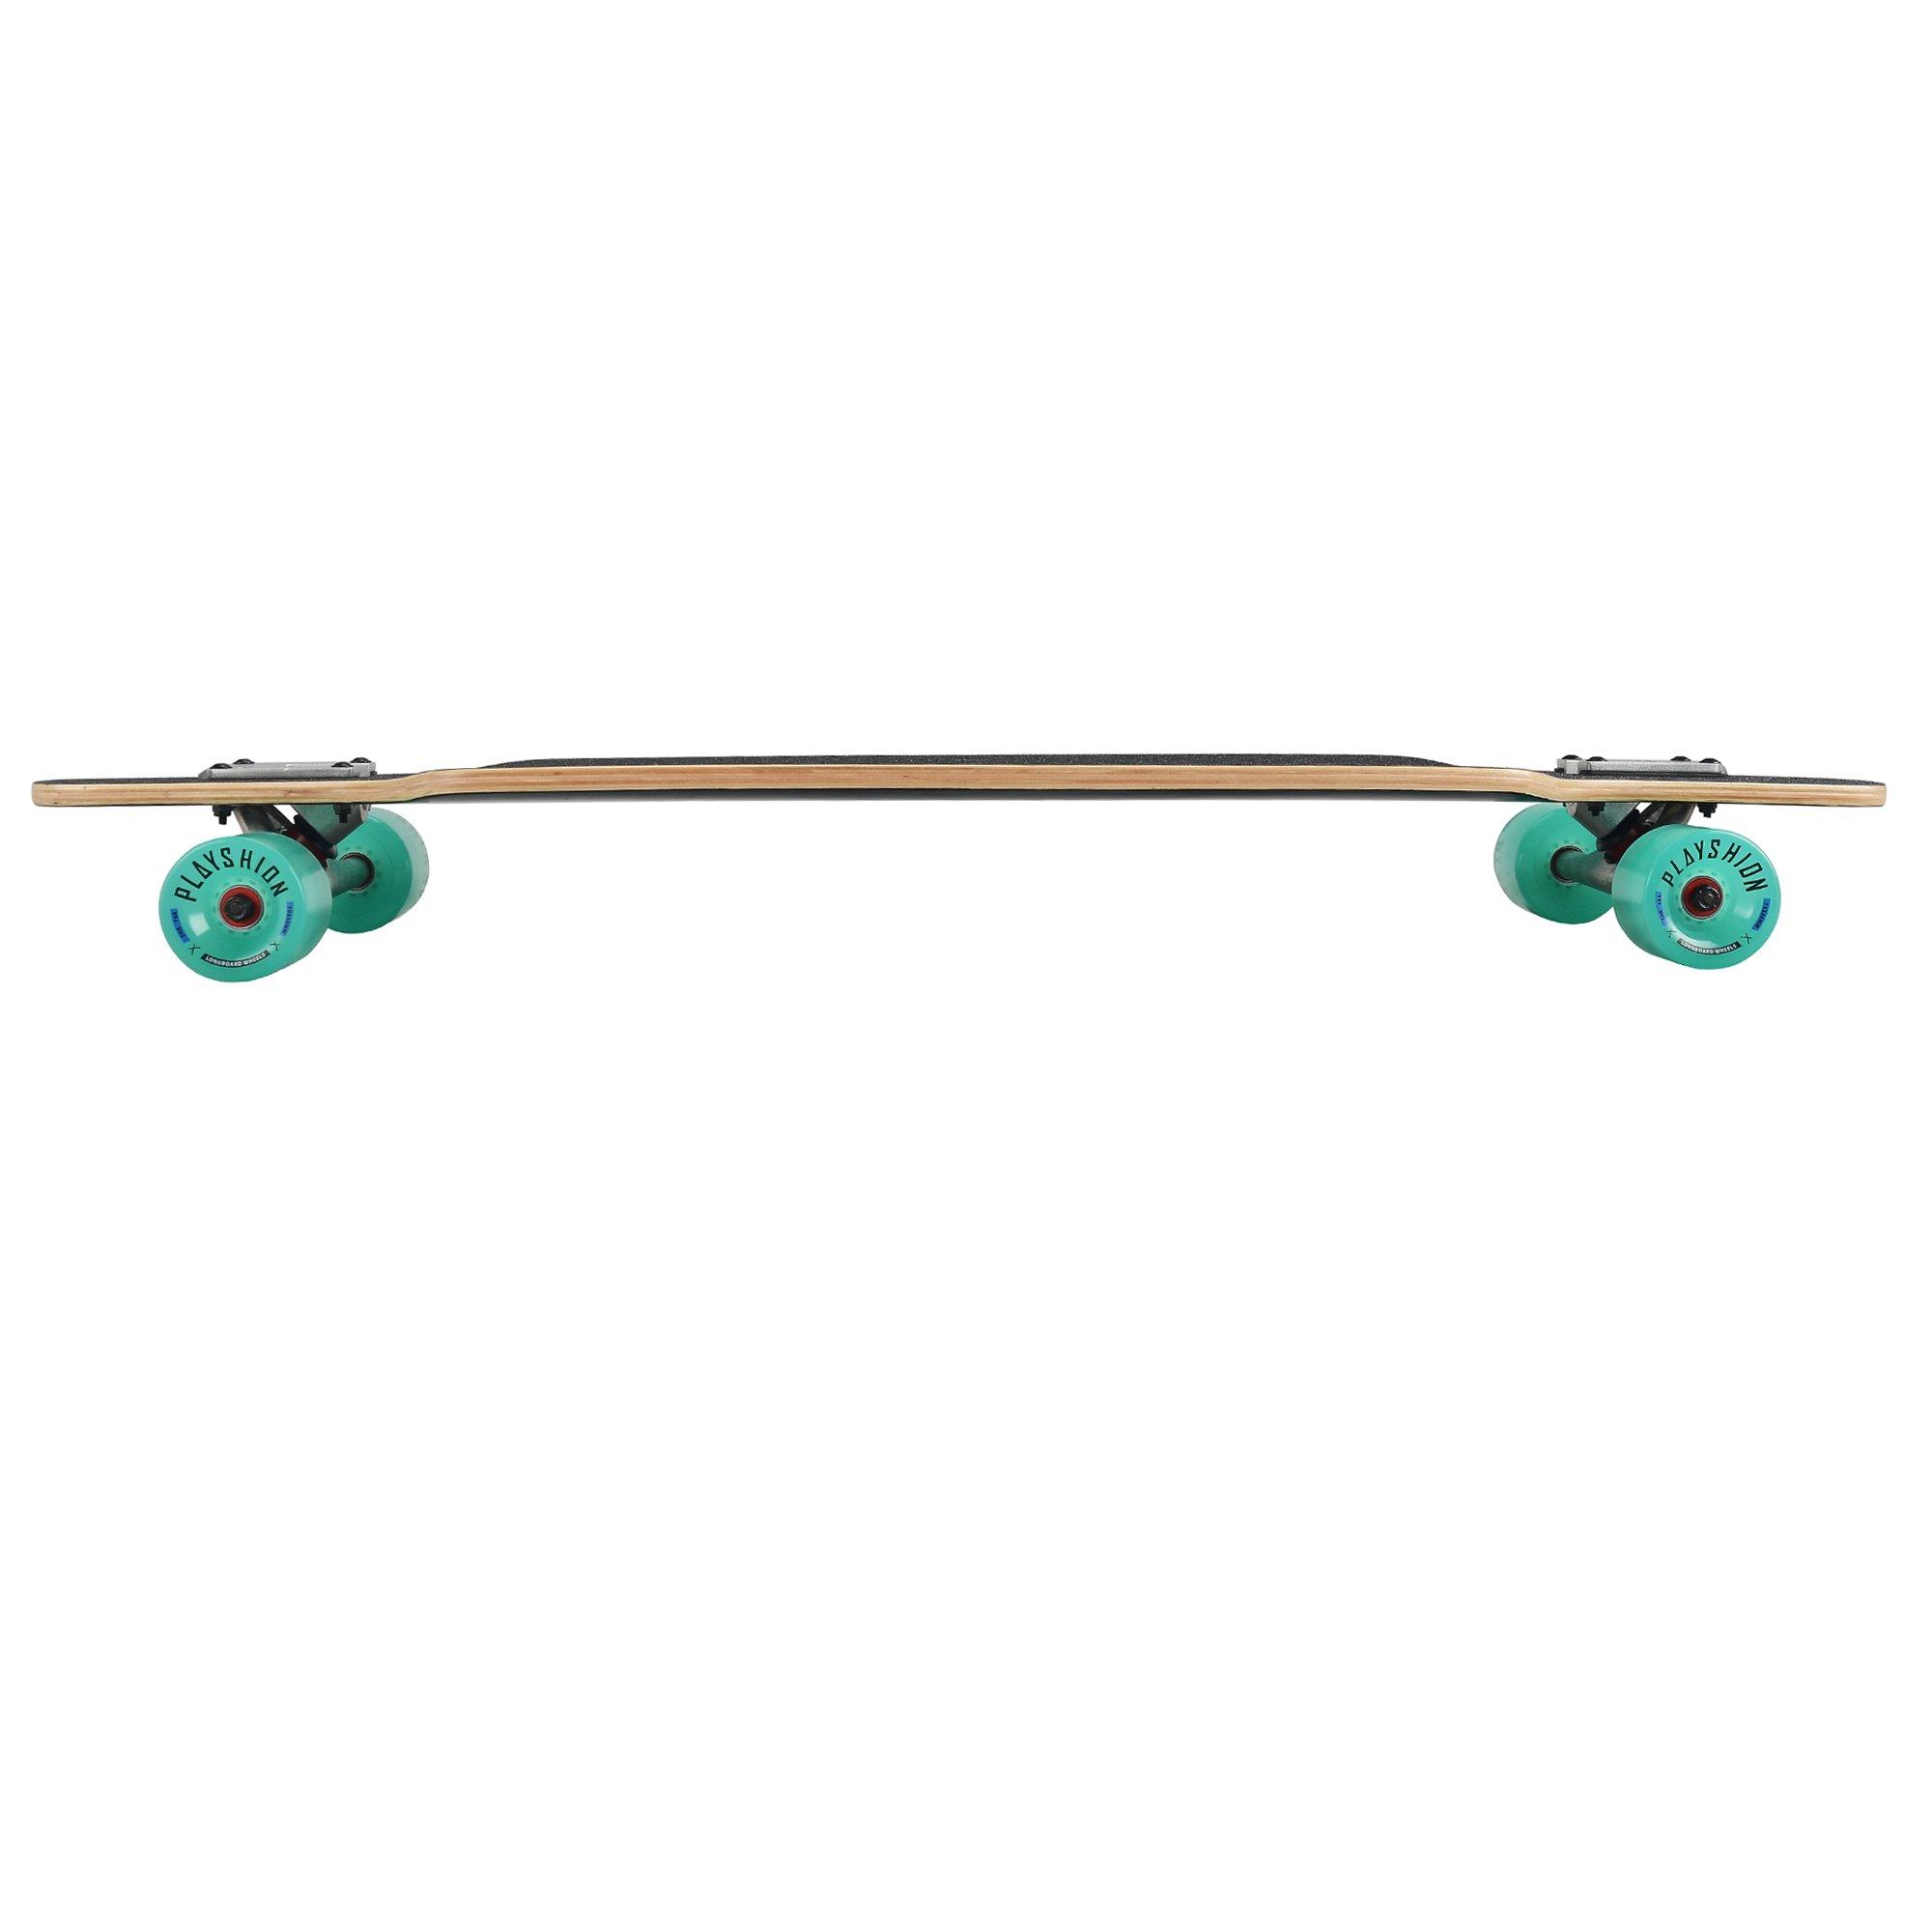 Playshion 39 Inch Drop Through Freestyle Longboard Skateboard Cruiser by Playshion (Image #7)